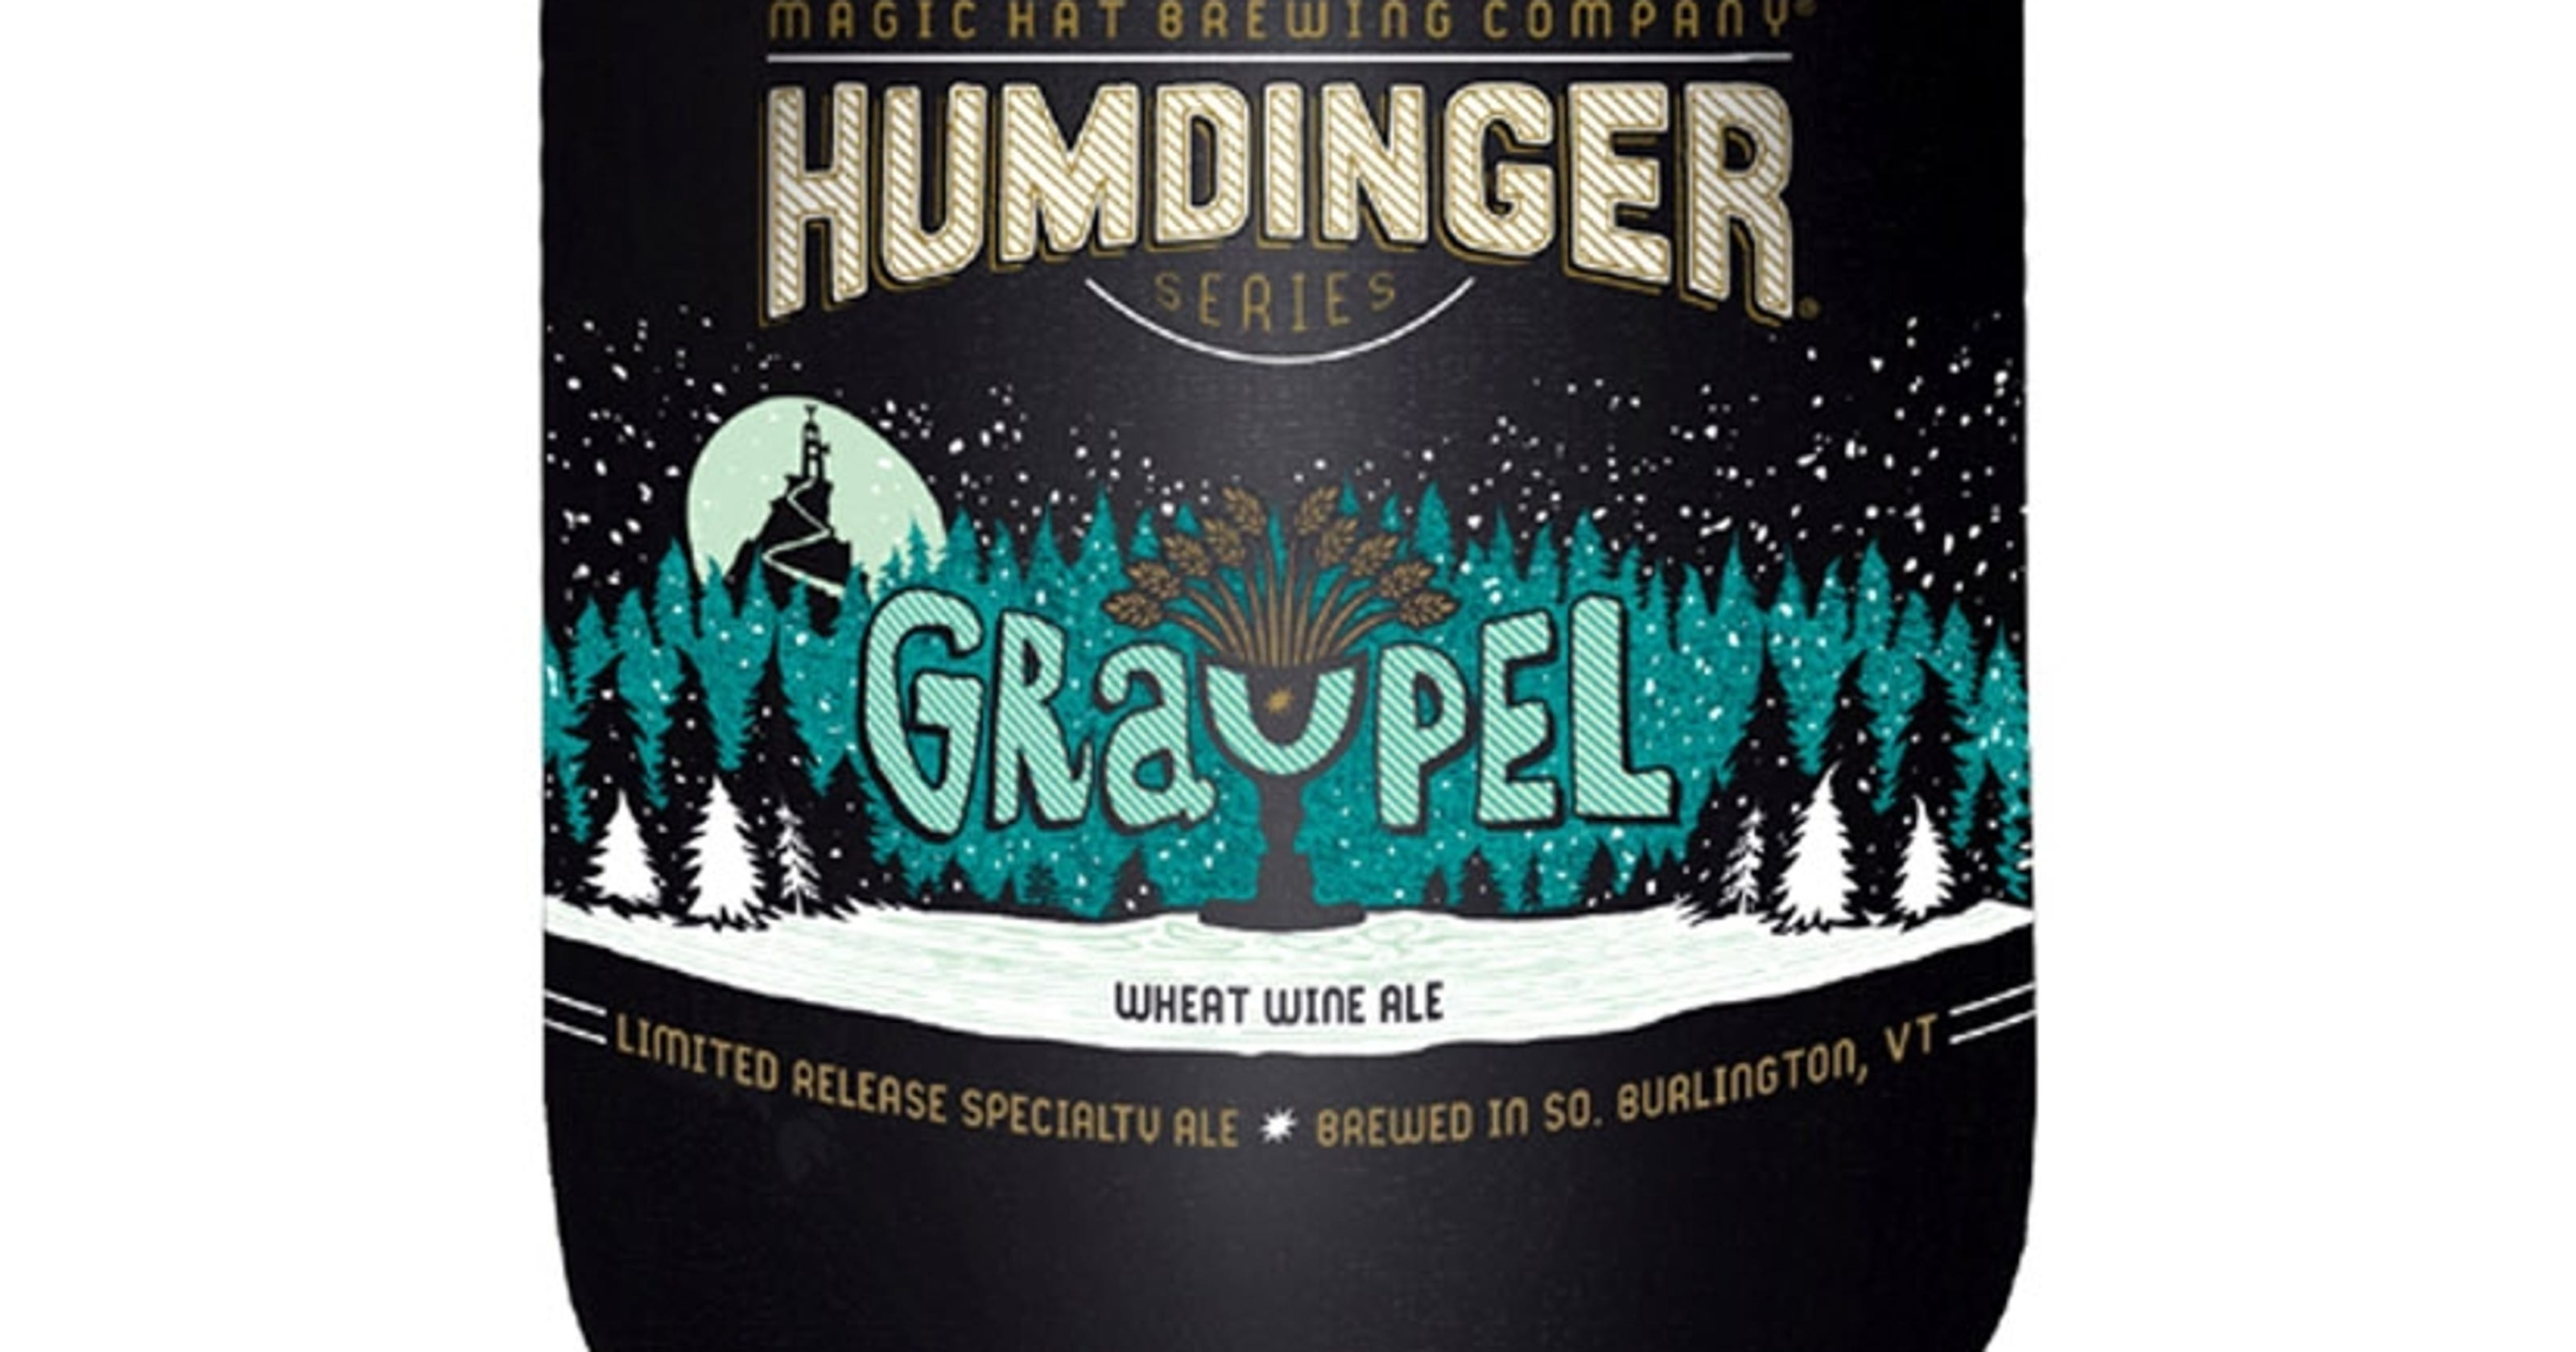 00ead9ffea6 Beer Man  Graupel Wheat welcome in winter